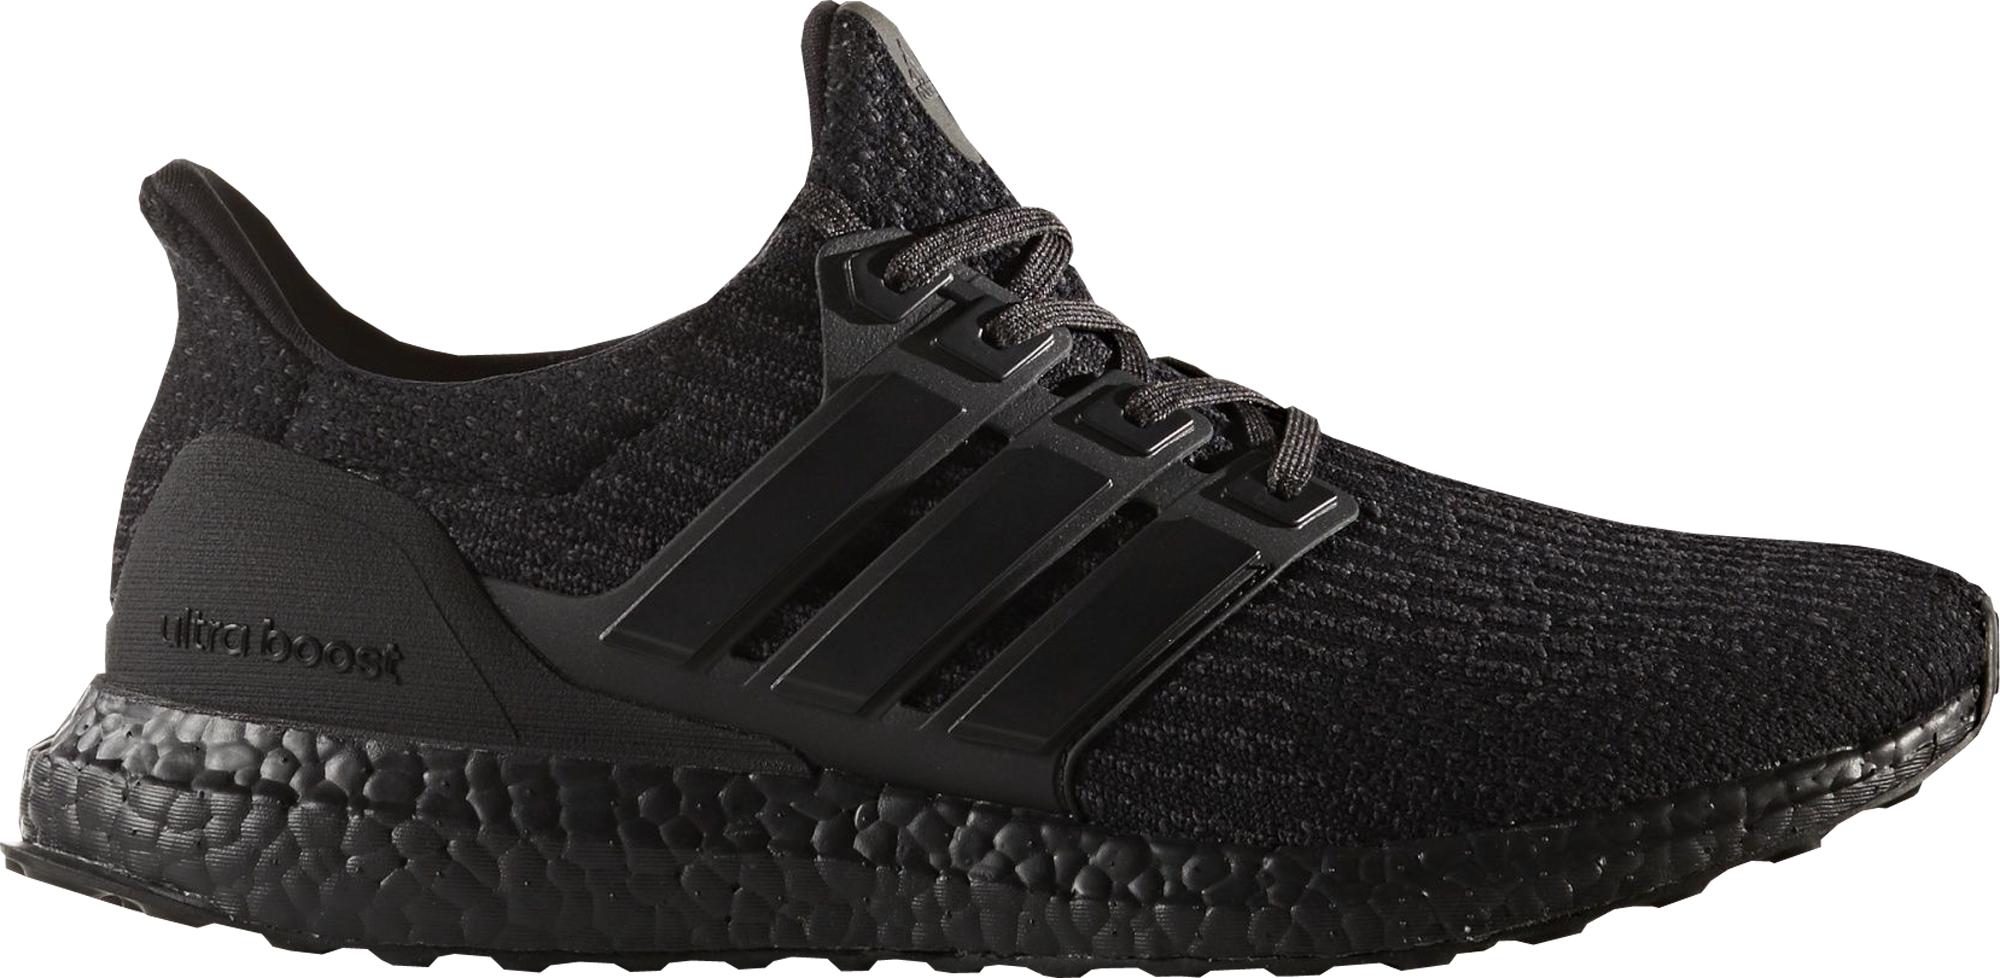 adidas Ultra Boost 3.0 Triple Black 2.0